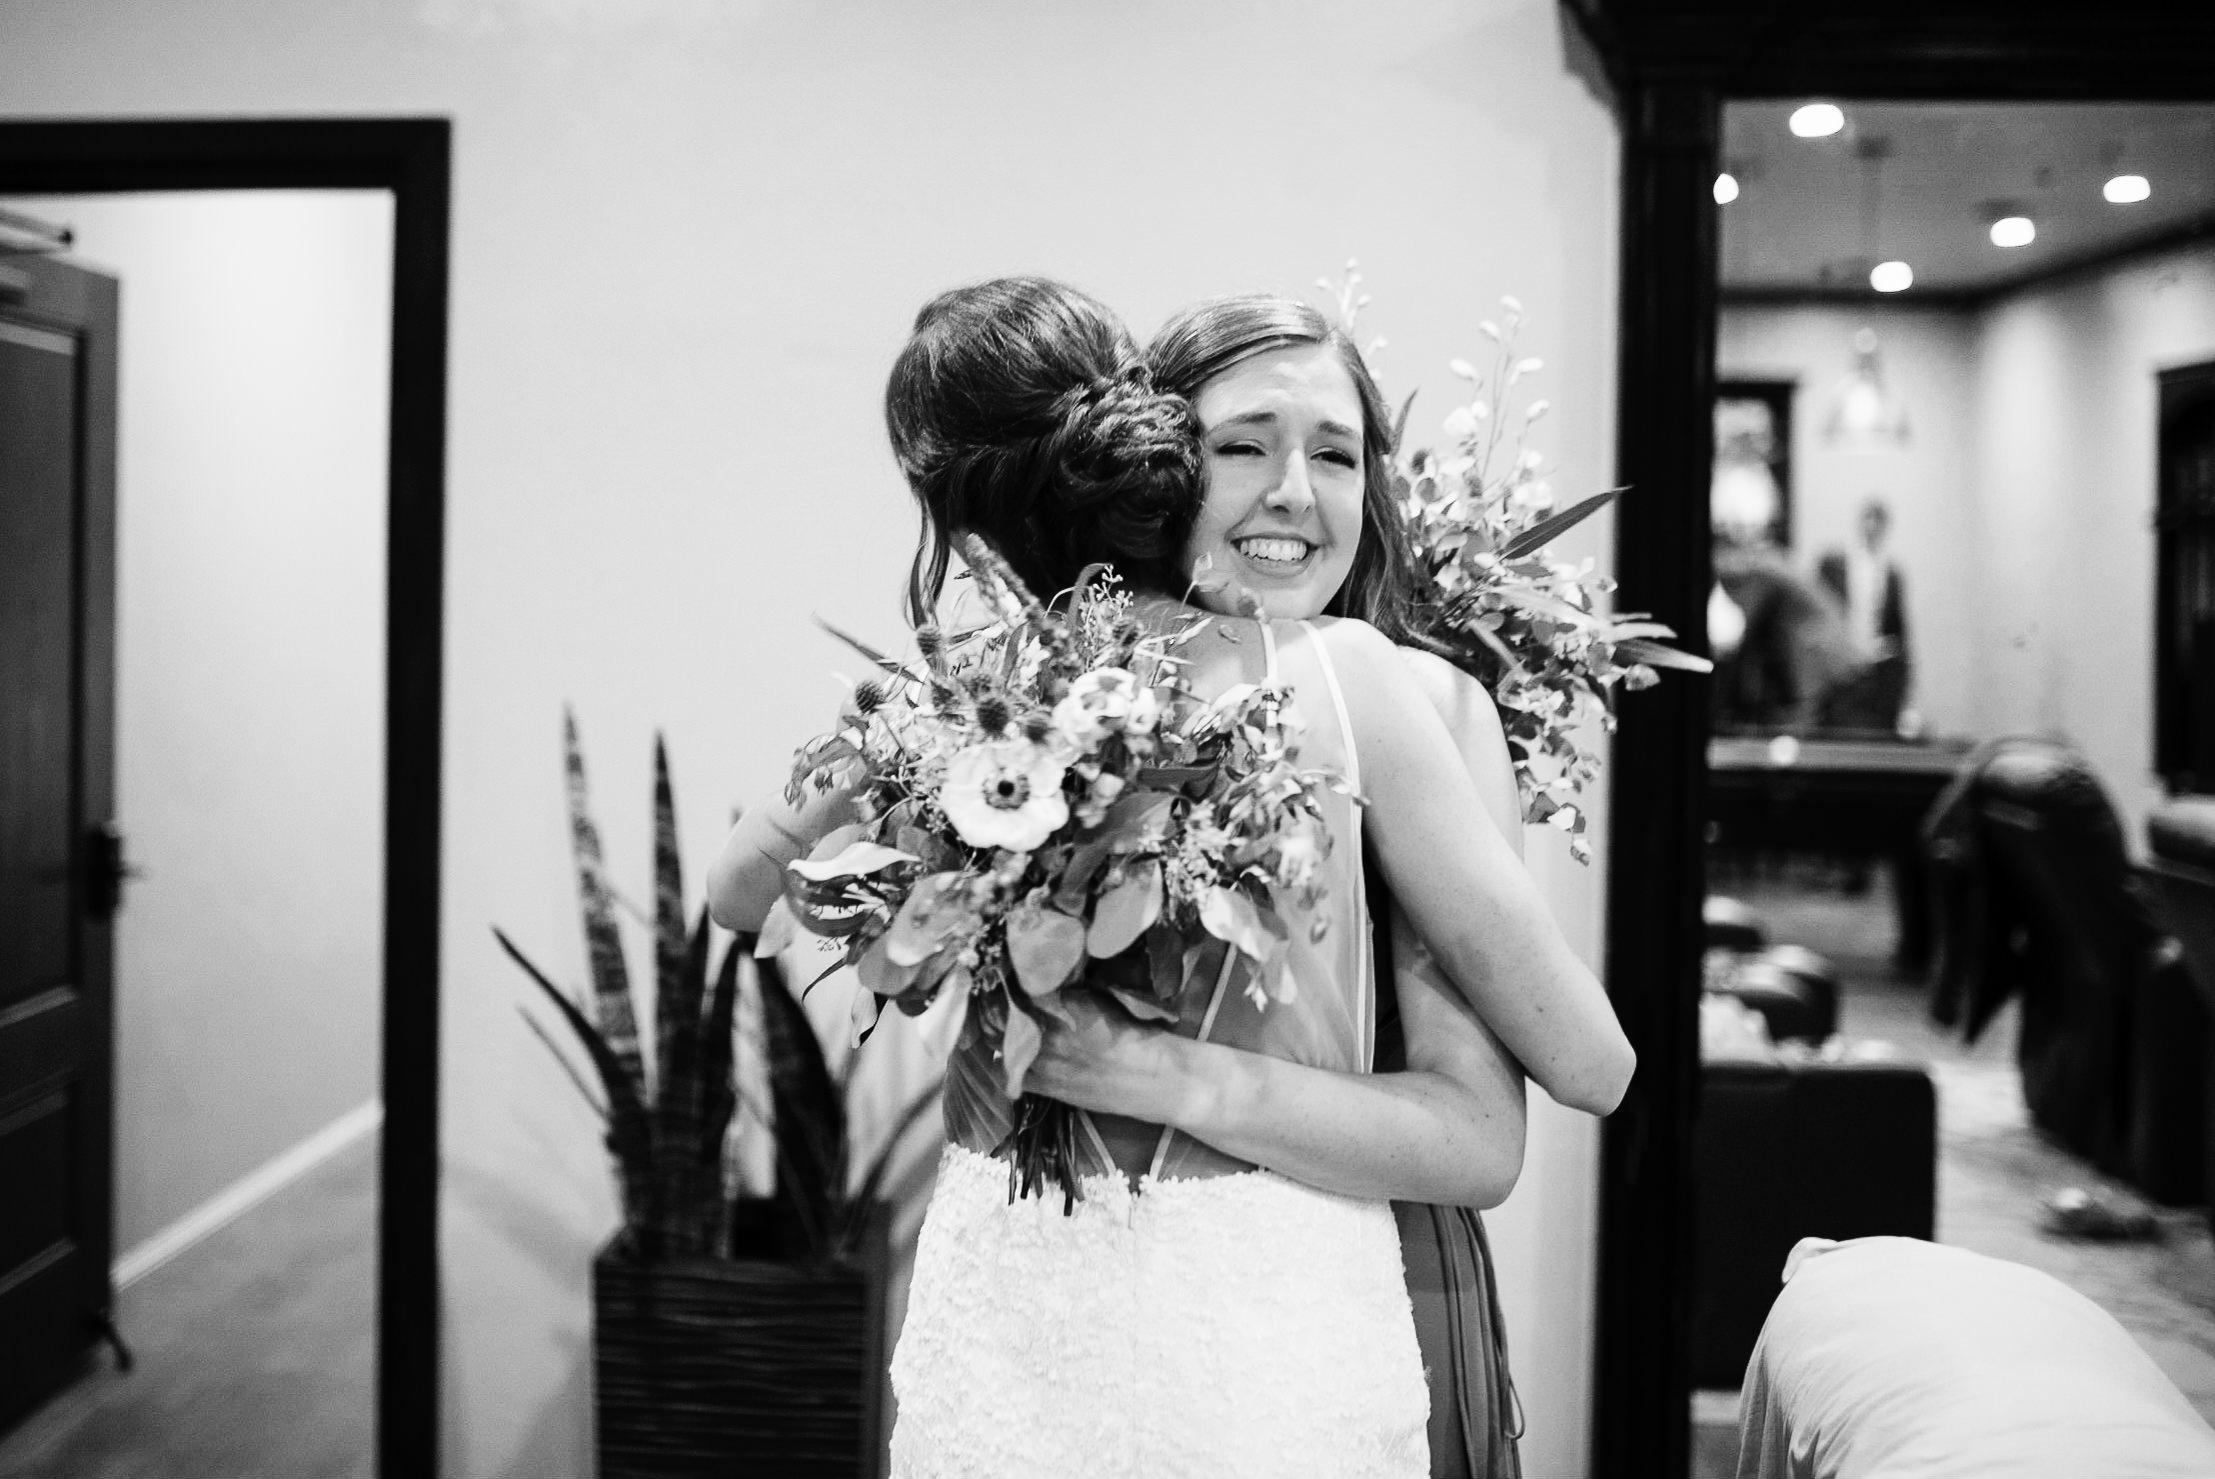 okc-wedding-photographer-coles-garden-wedding-okc-best-wedding-photographers-131.jpg